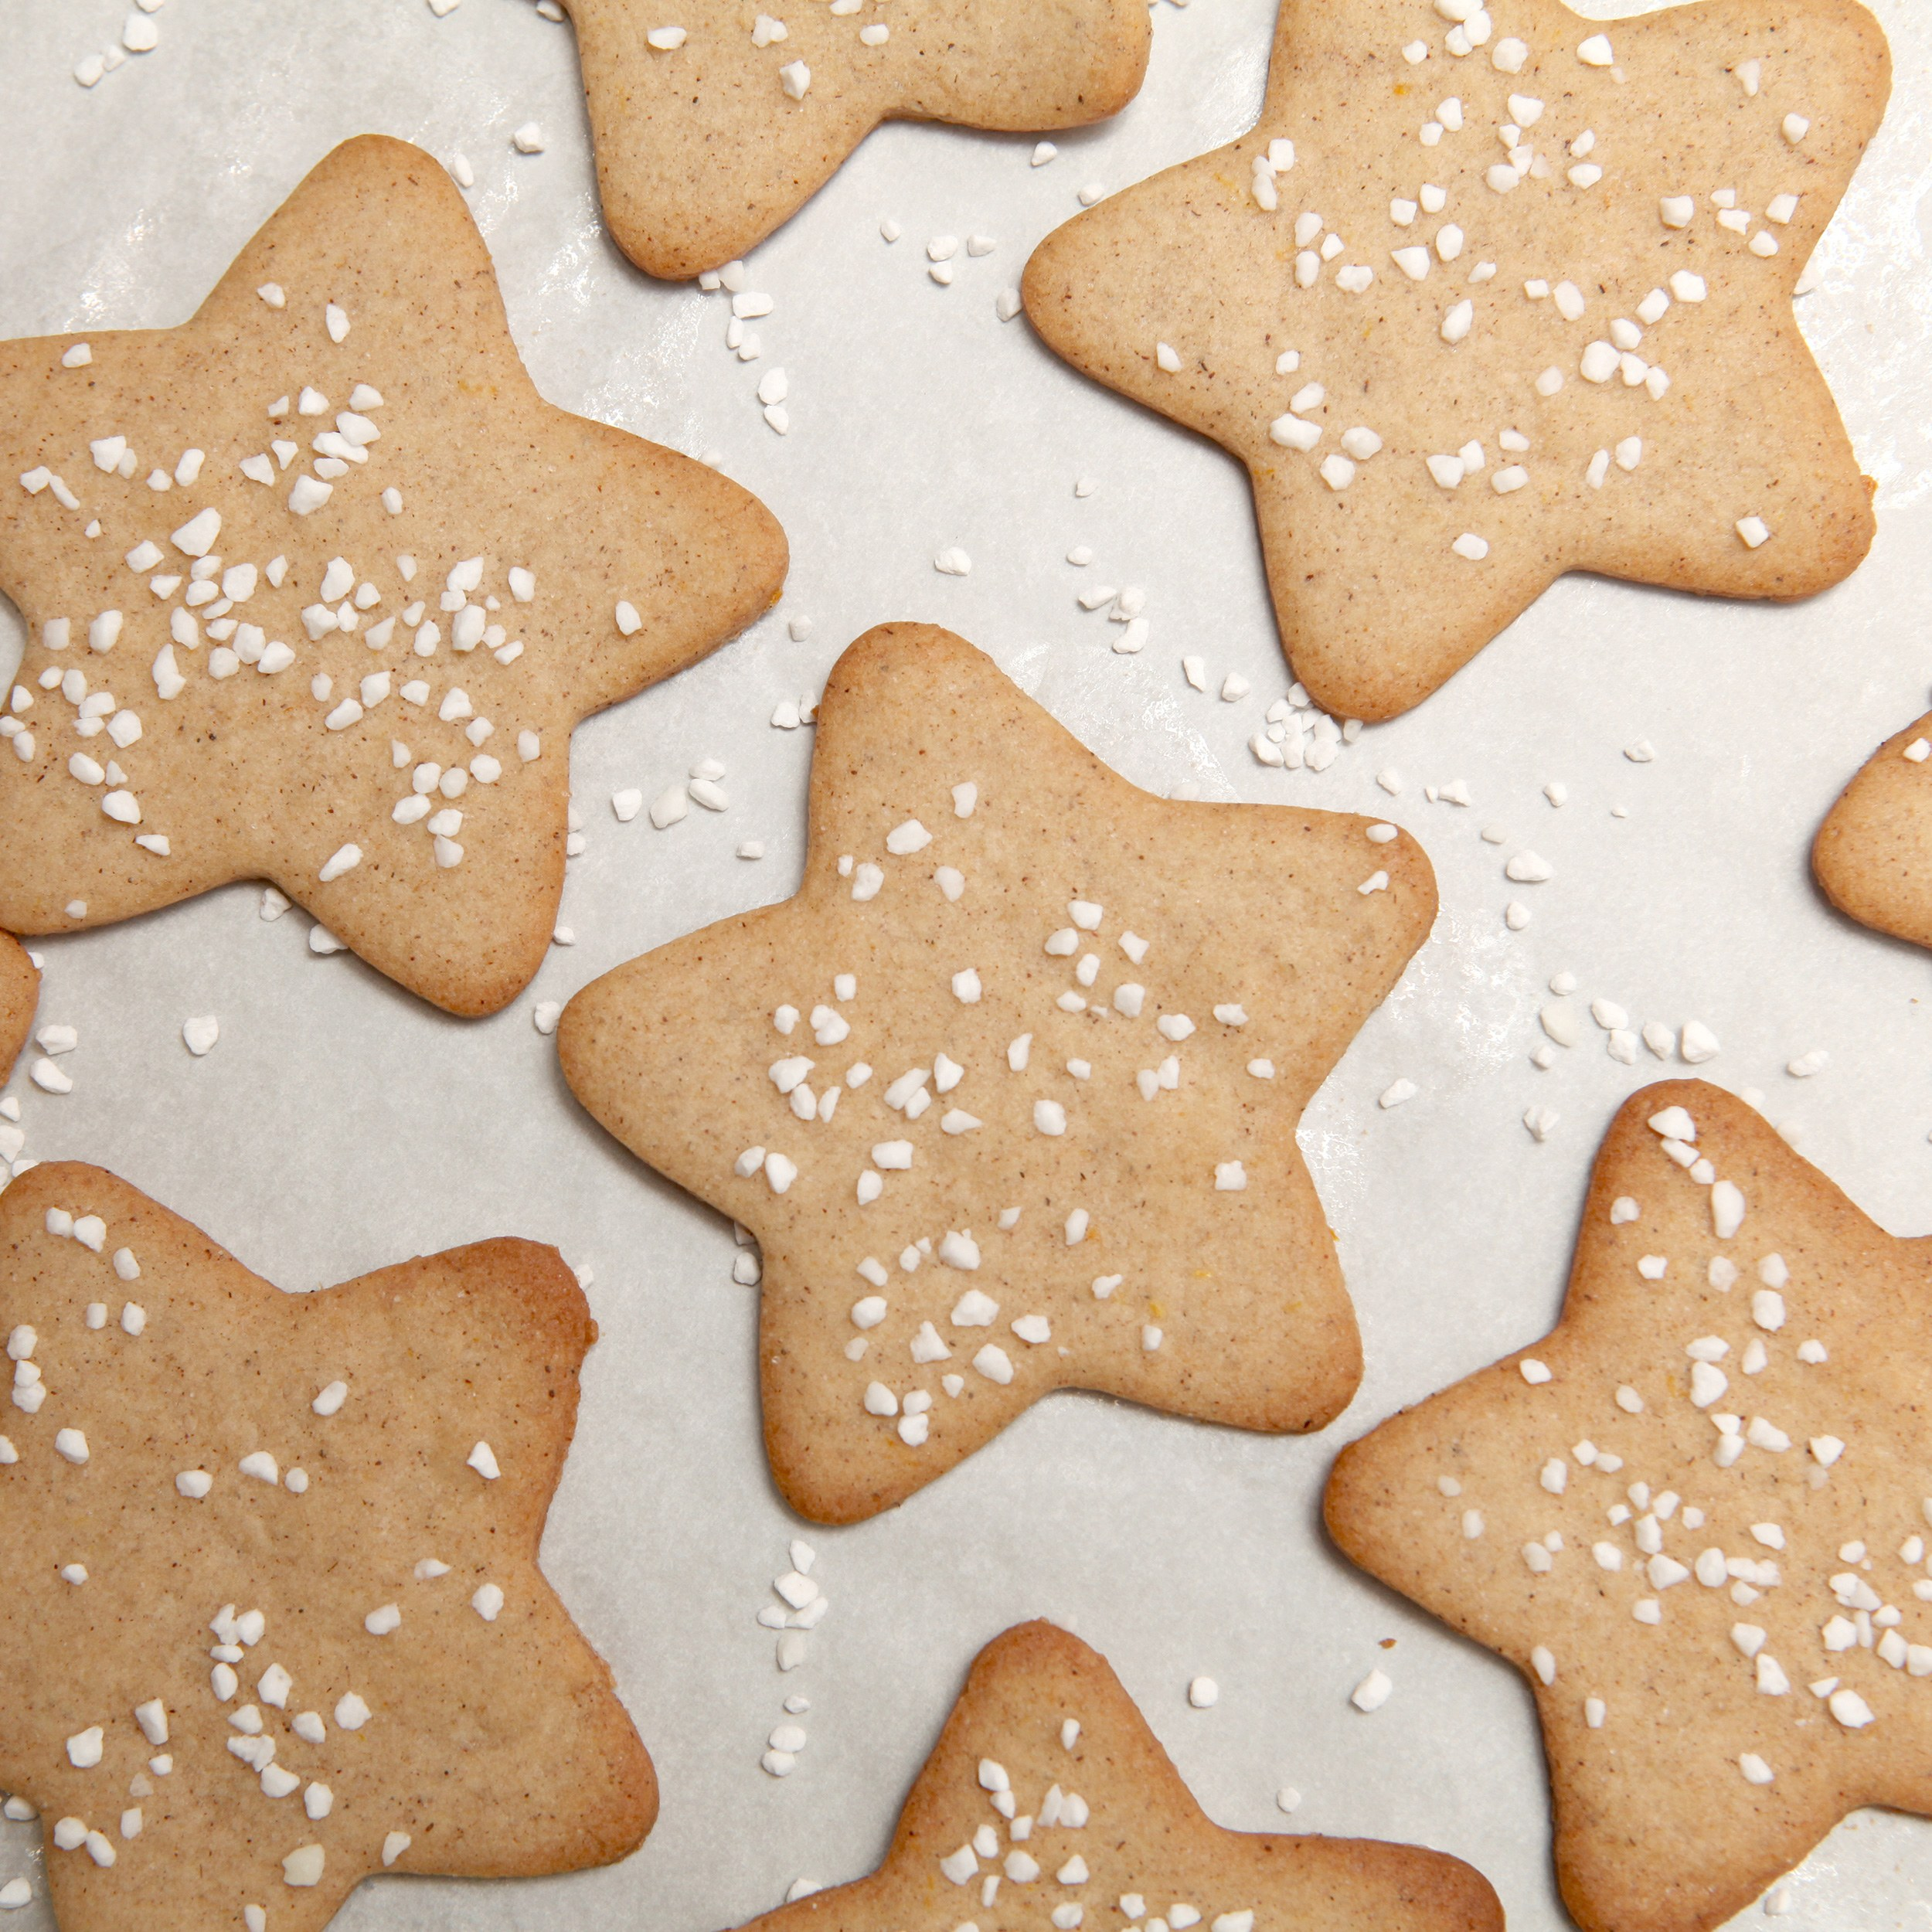 Pepparkakor (Swedish Ginger Cookies) recipe | Epicurious.com